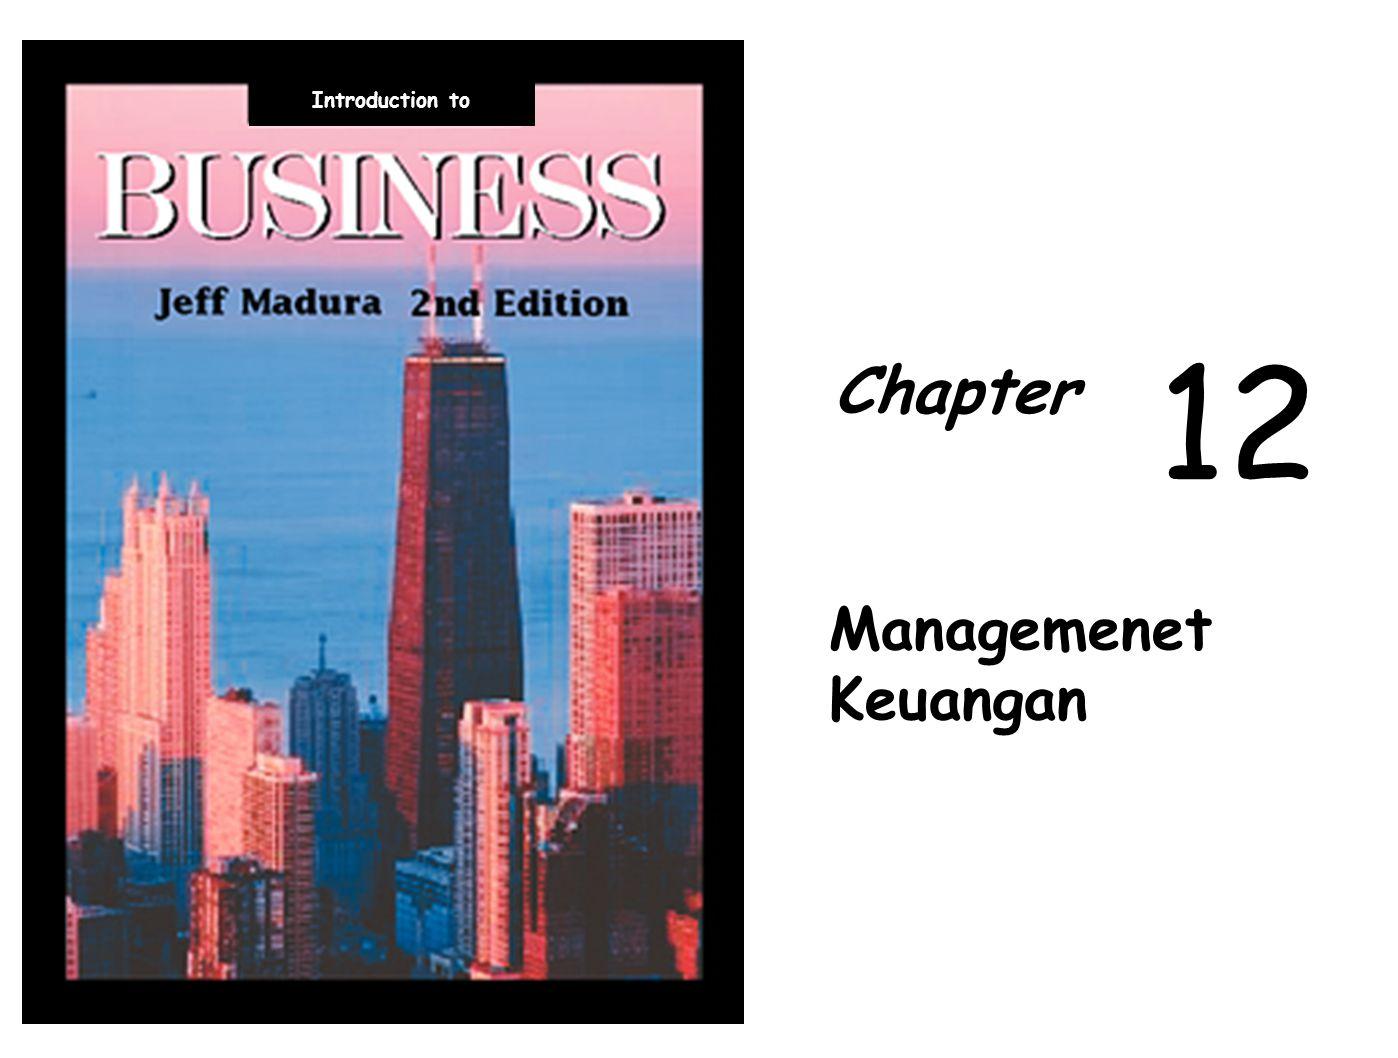 Introduction to Chapter 1212 Managemenet Keuangan